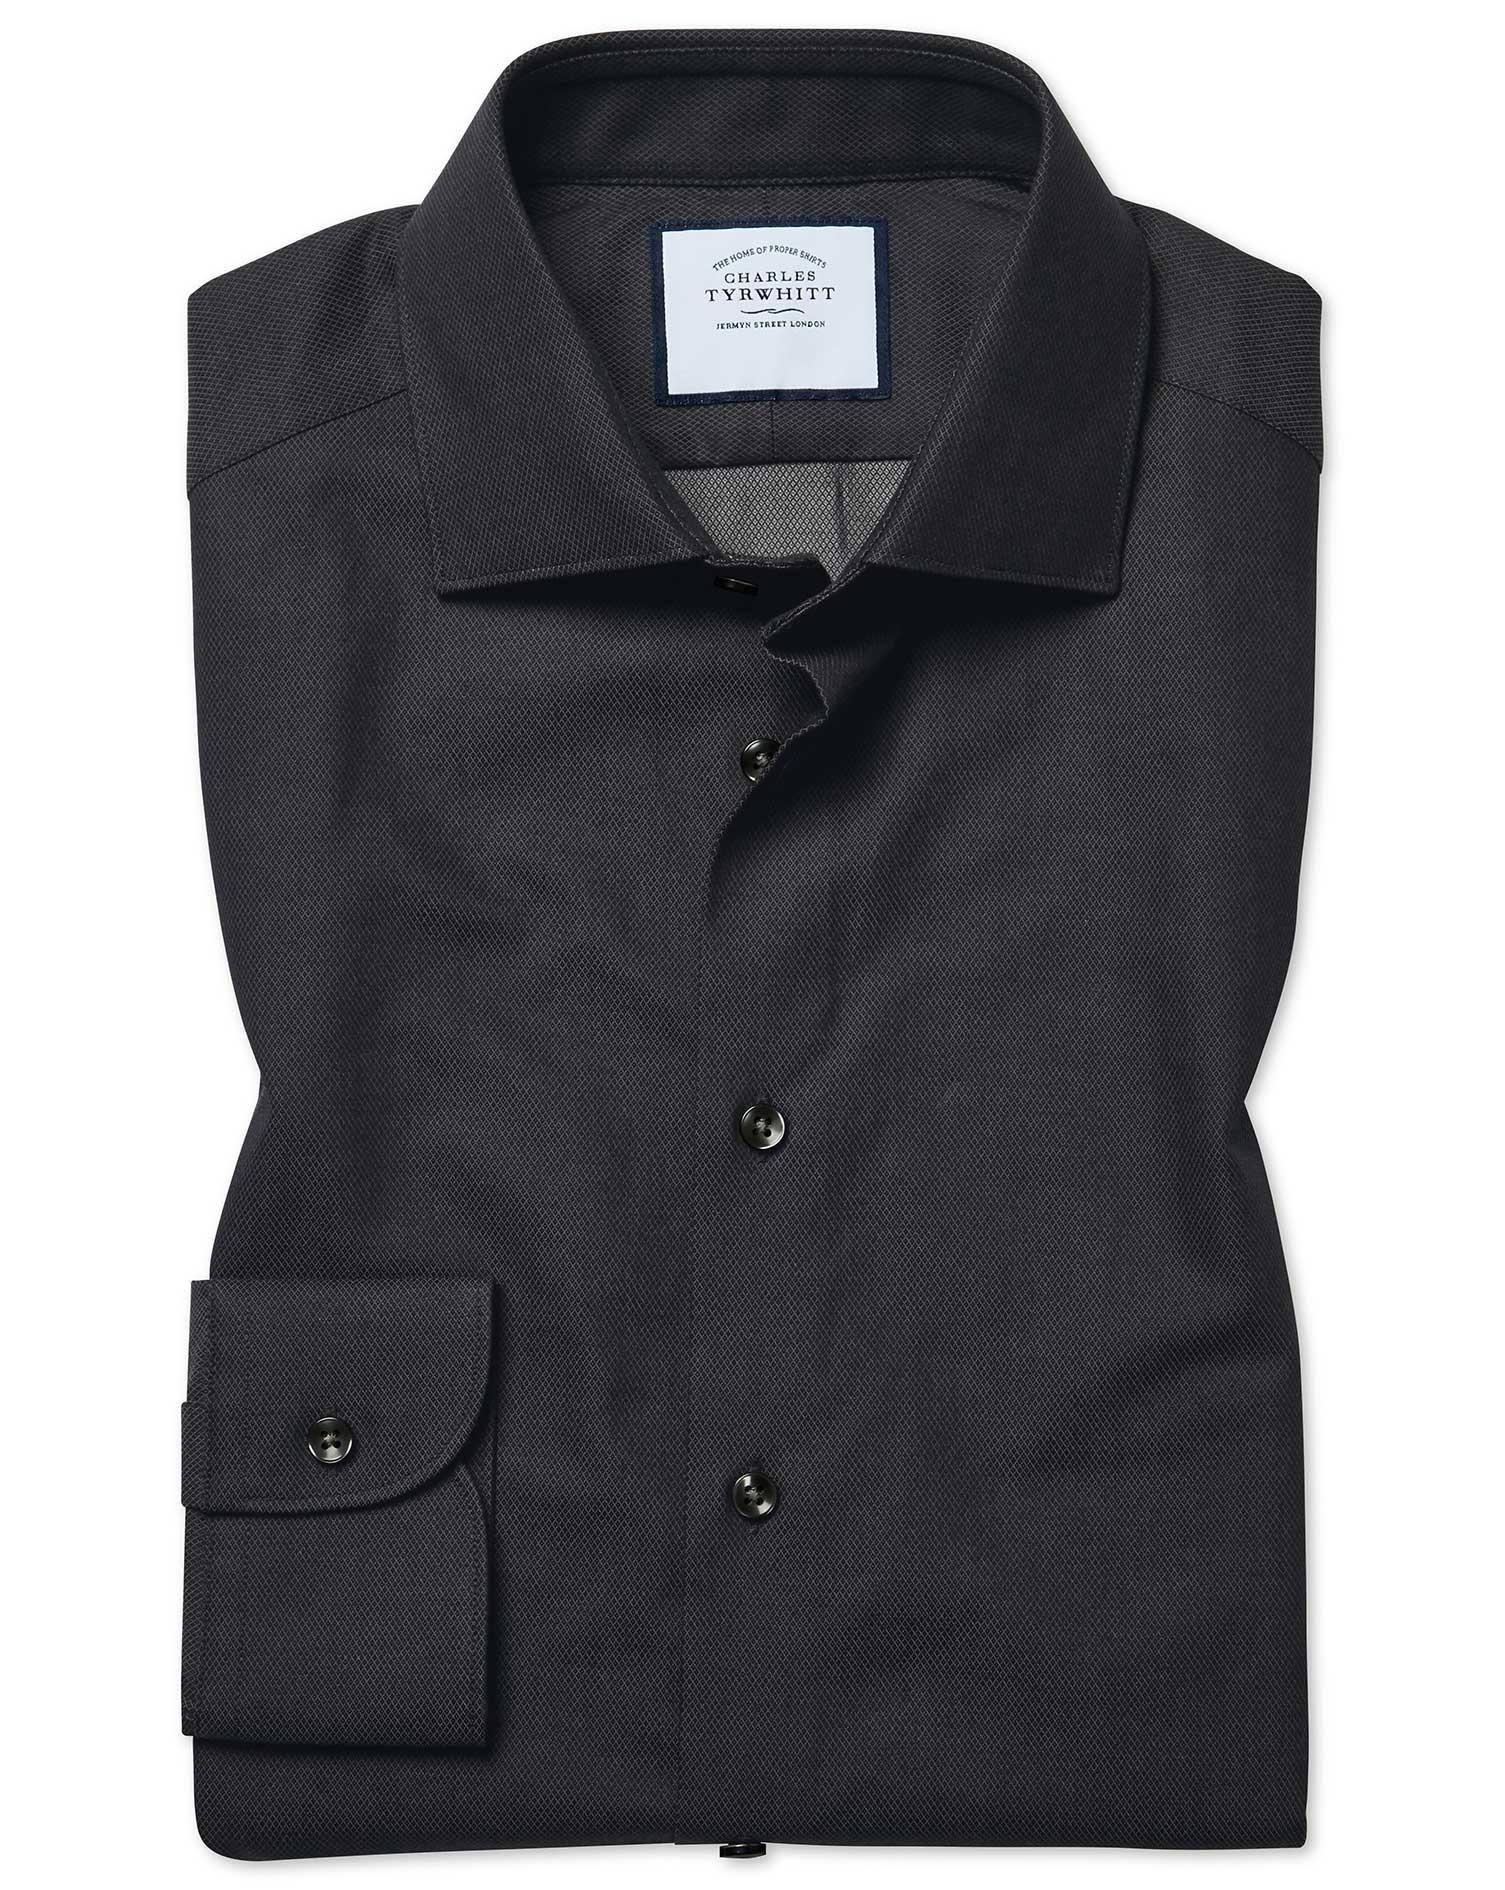 Slim Fit Micro Diamond Charcoal Cotton Formal Shirt Single Cuff Size 18/37 by Charles Tyrwhitt